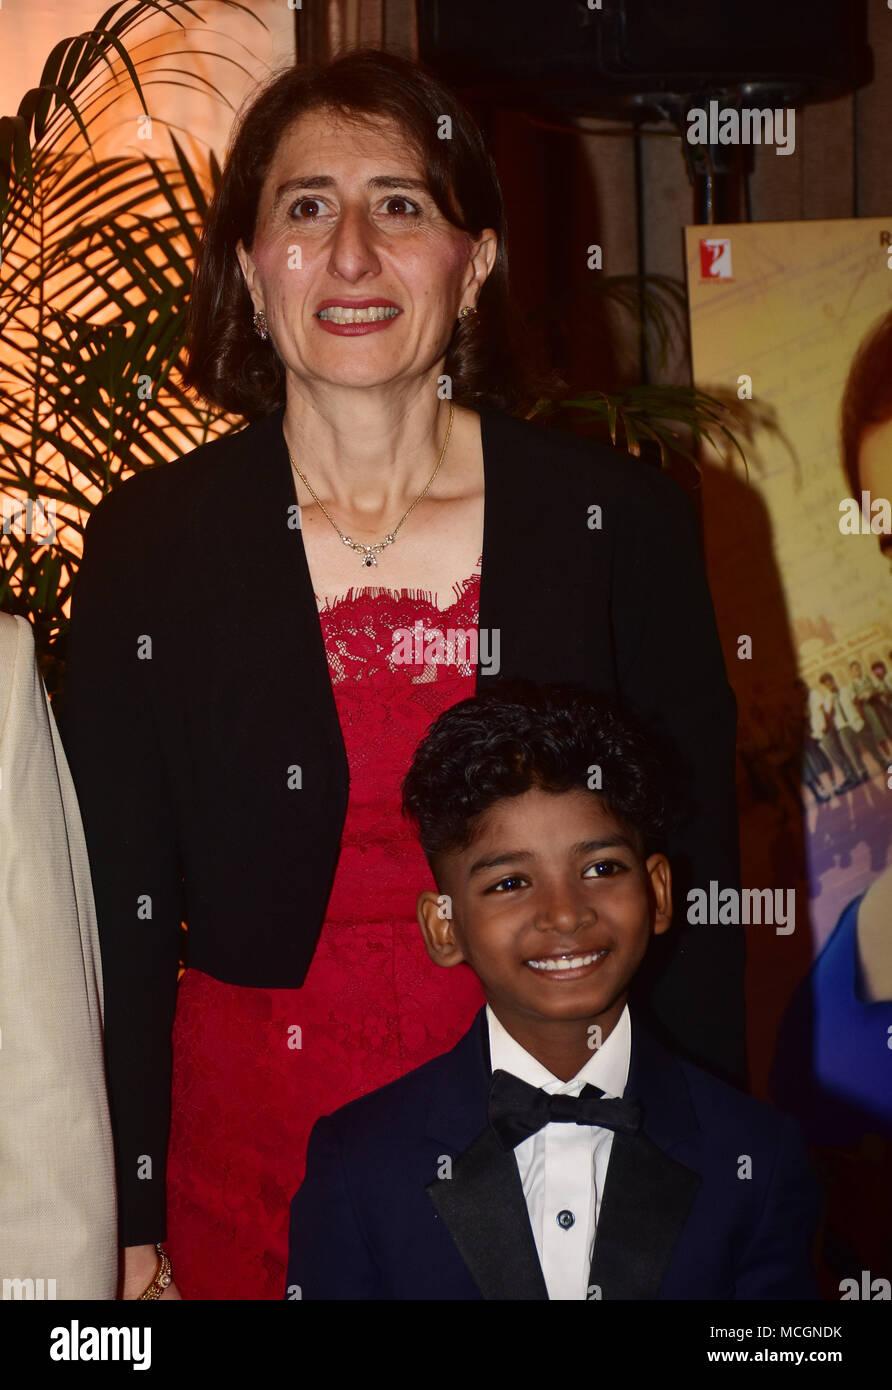 Indian Film Star Stock Photos & Indian Film Star Stock Images - Alamy